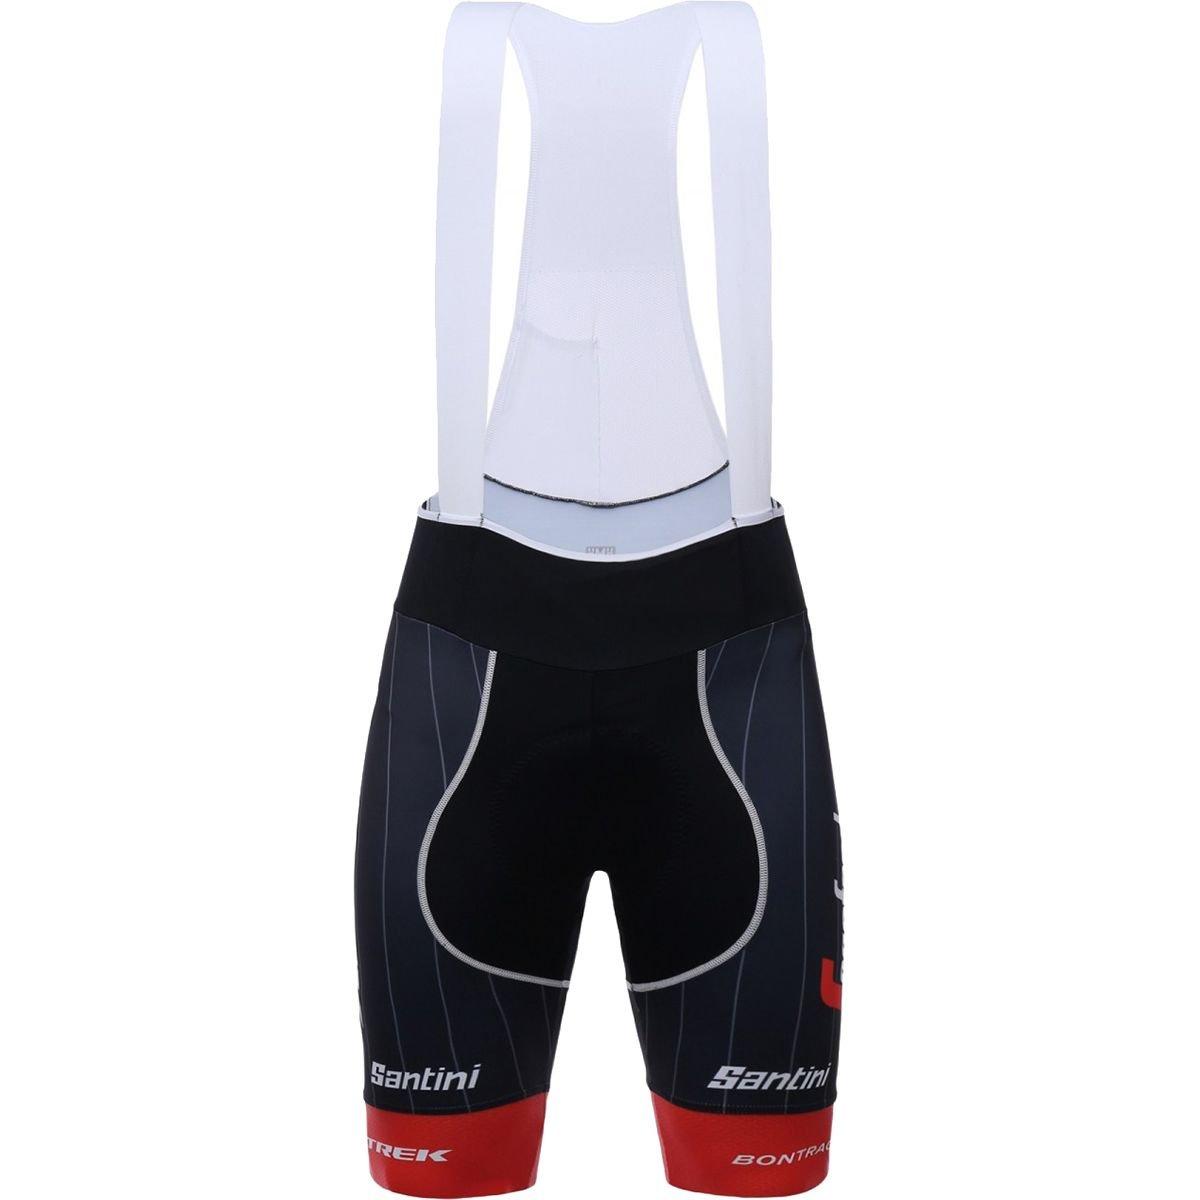 Santini trek-segafredo Pro Team Bib Short – Men 's B079S3LLLD Small|レッド レッド Small